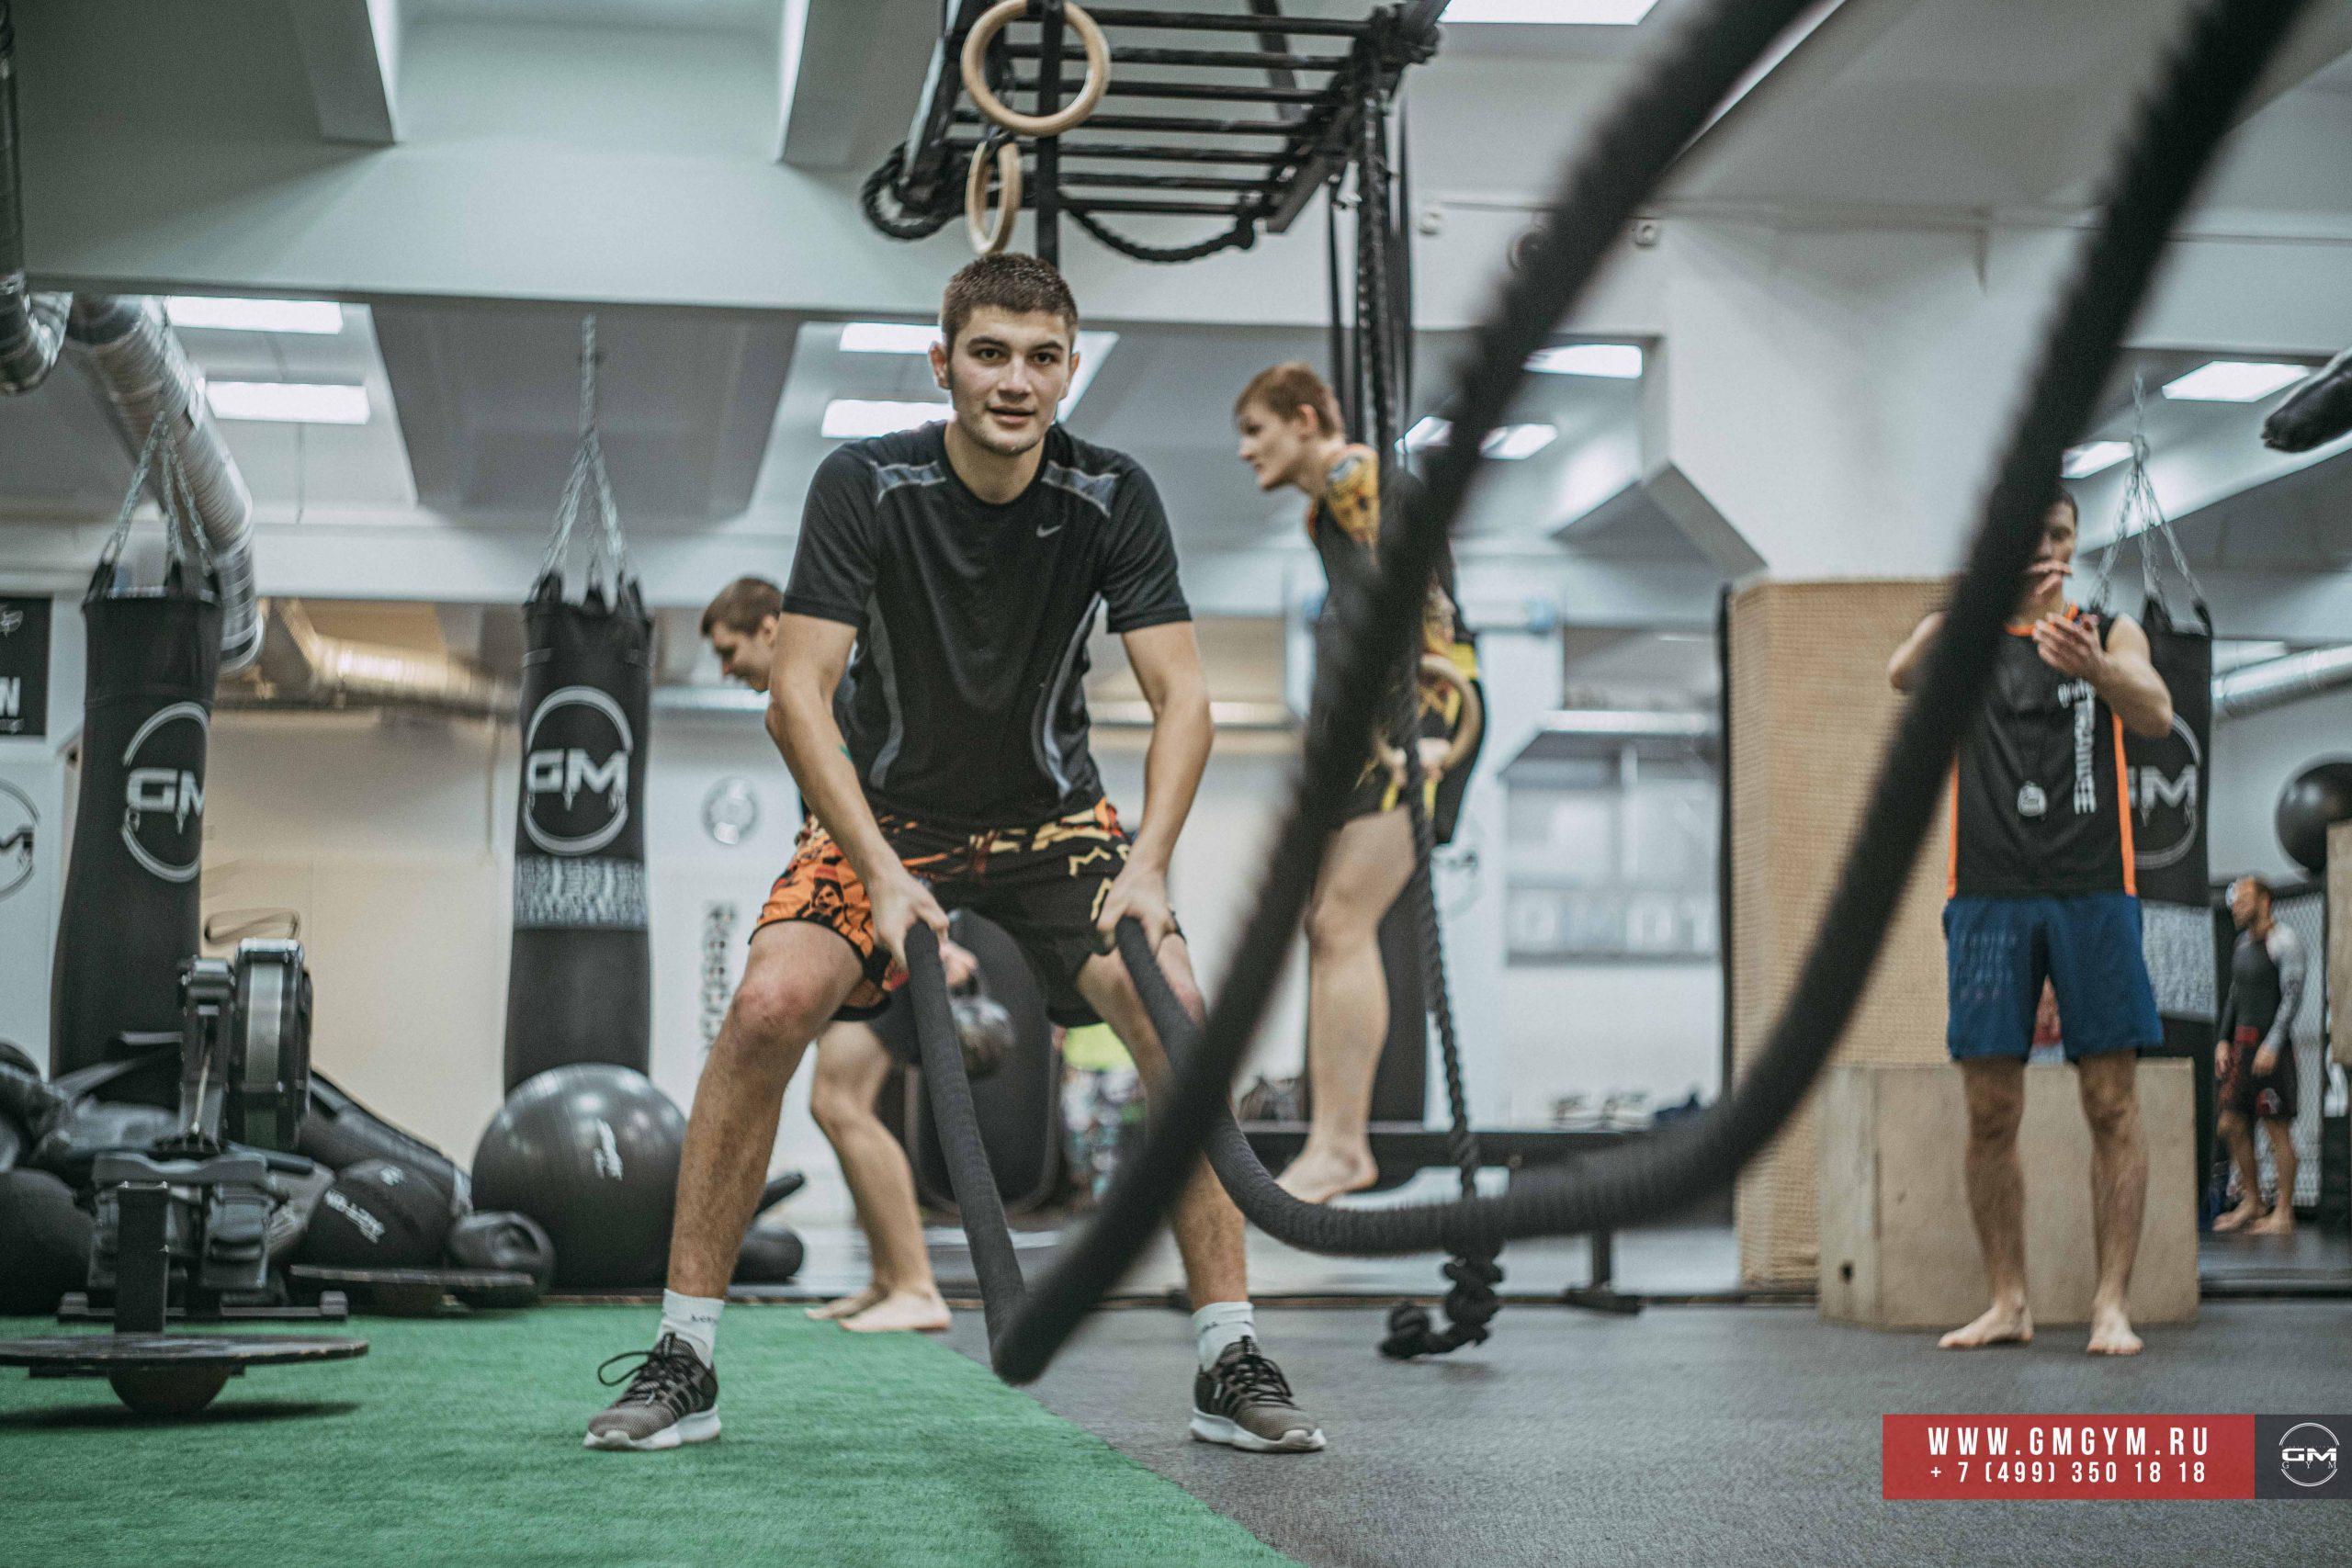 Алексей Ганненко Тренер по ММА 4